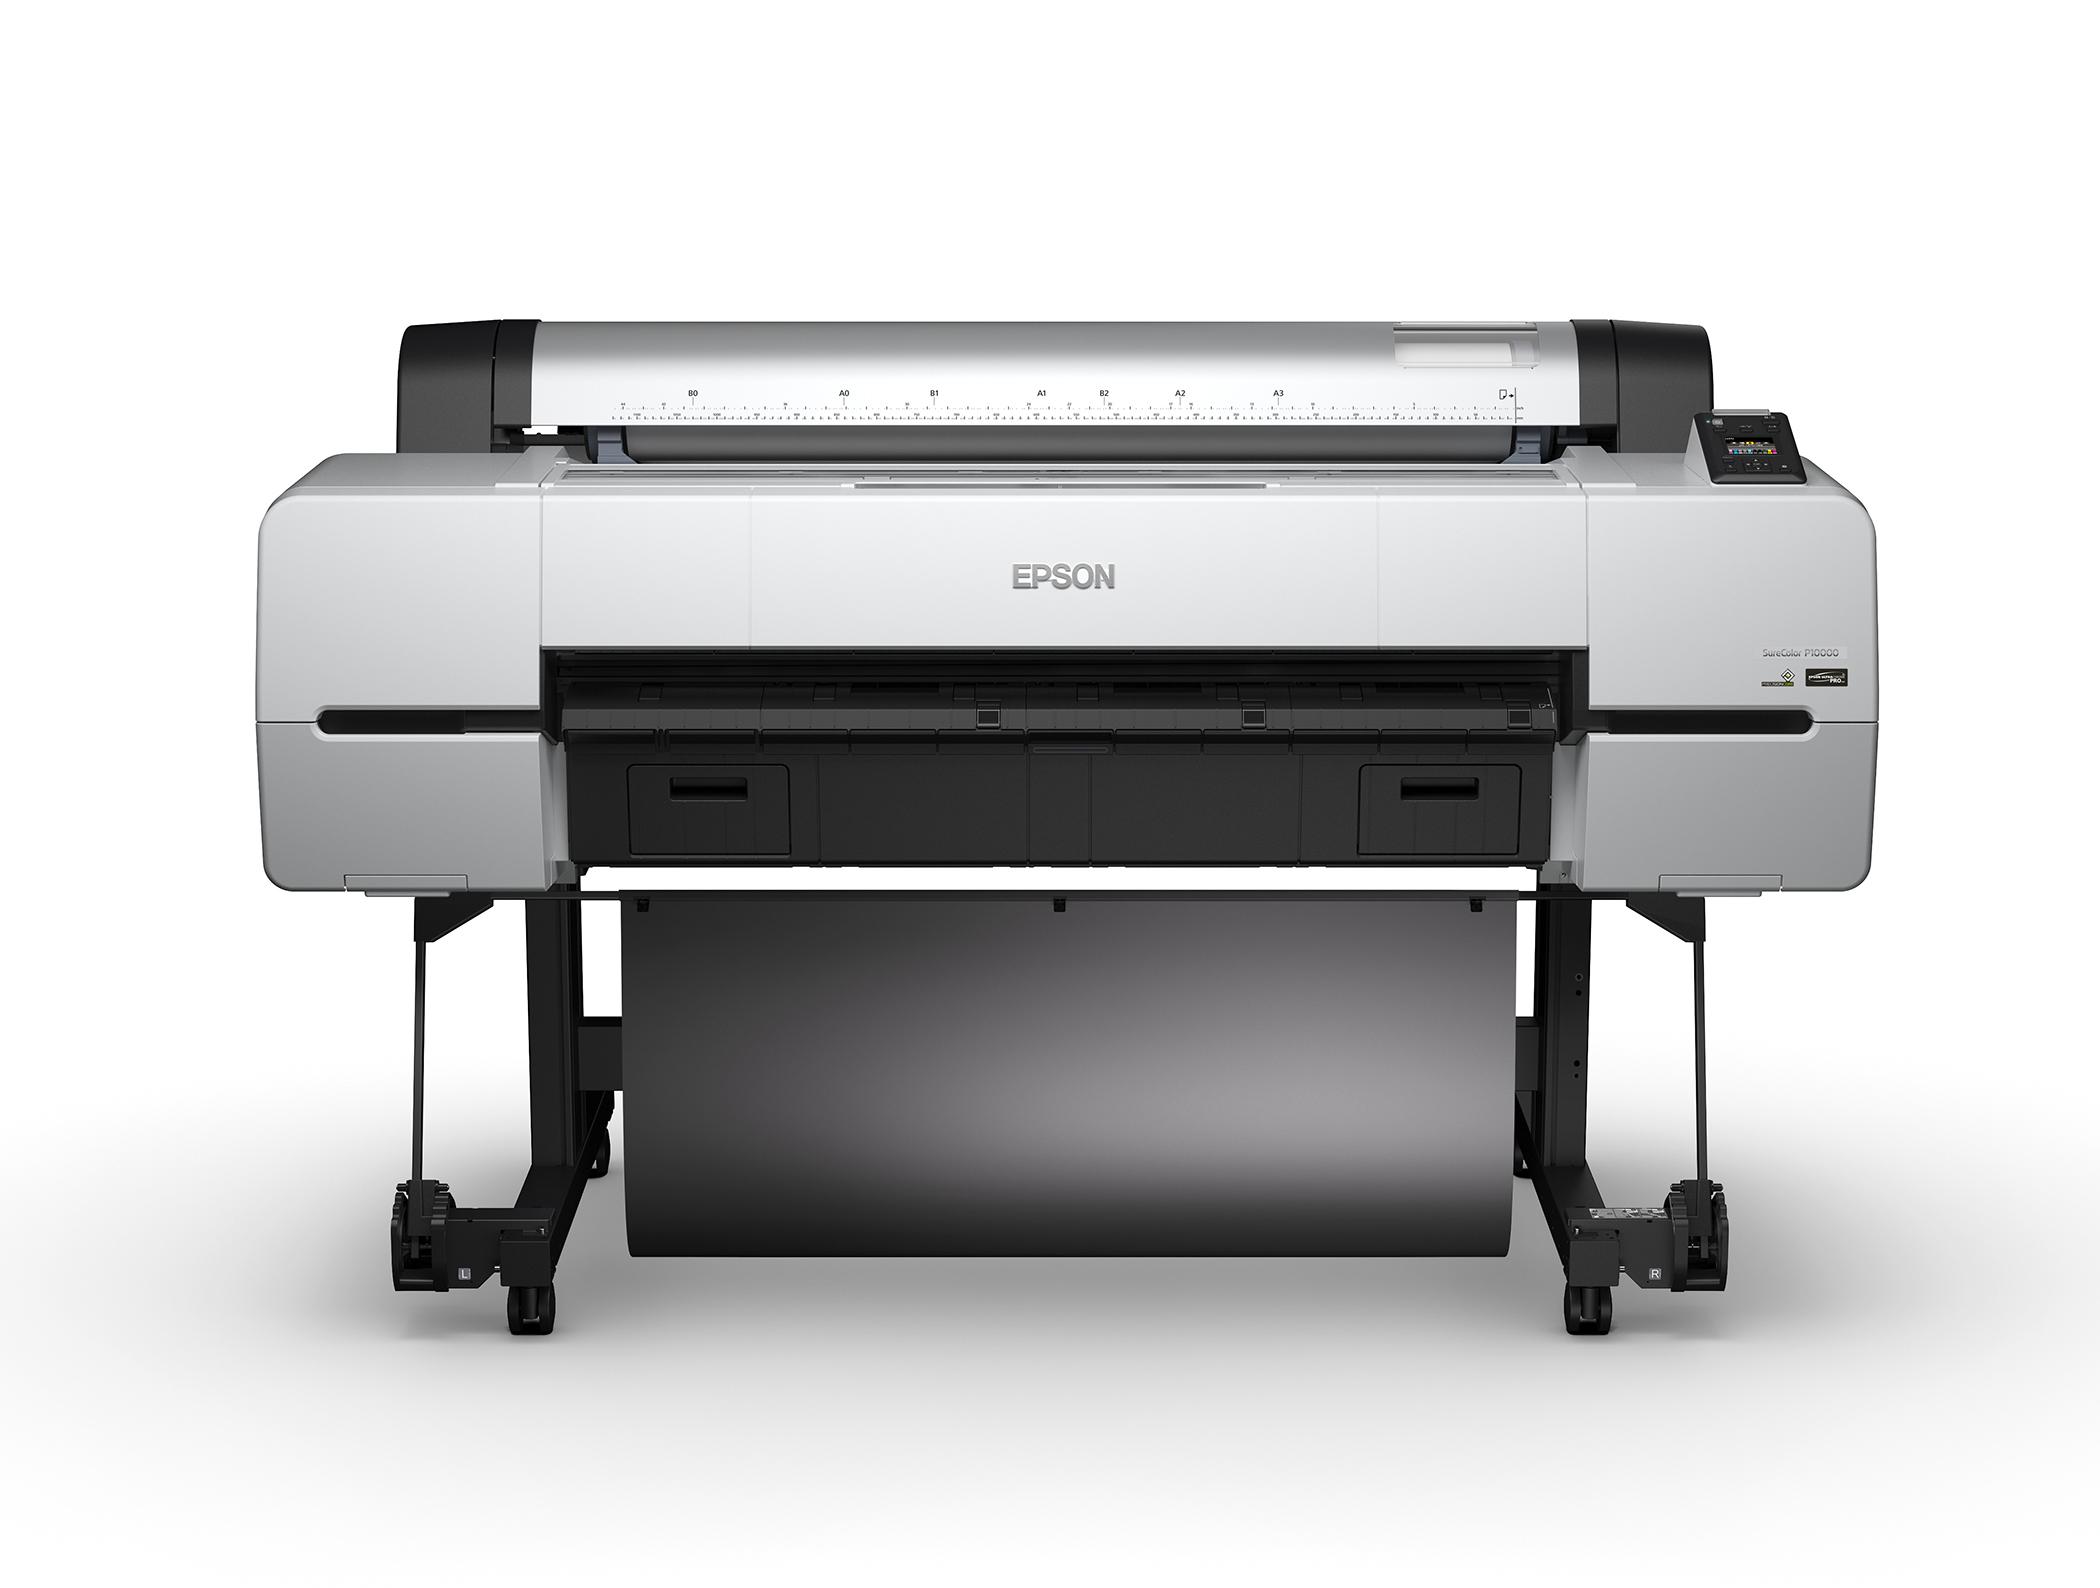 Epson SureColor P10000 44 - Imaging Spectrum